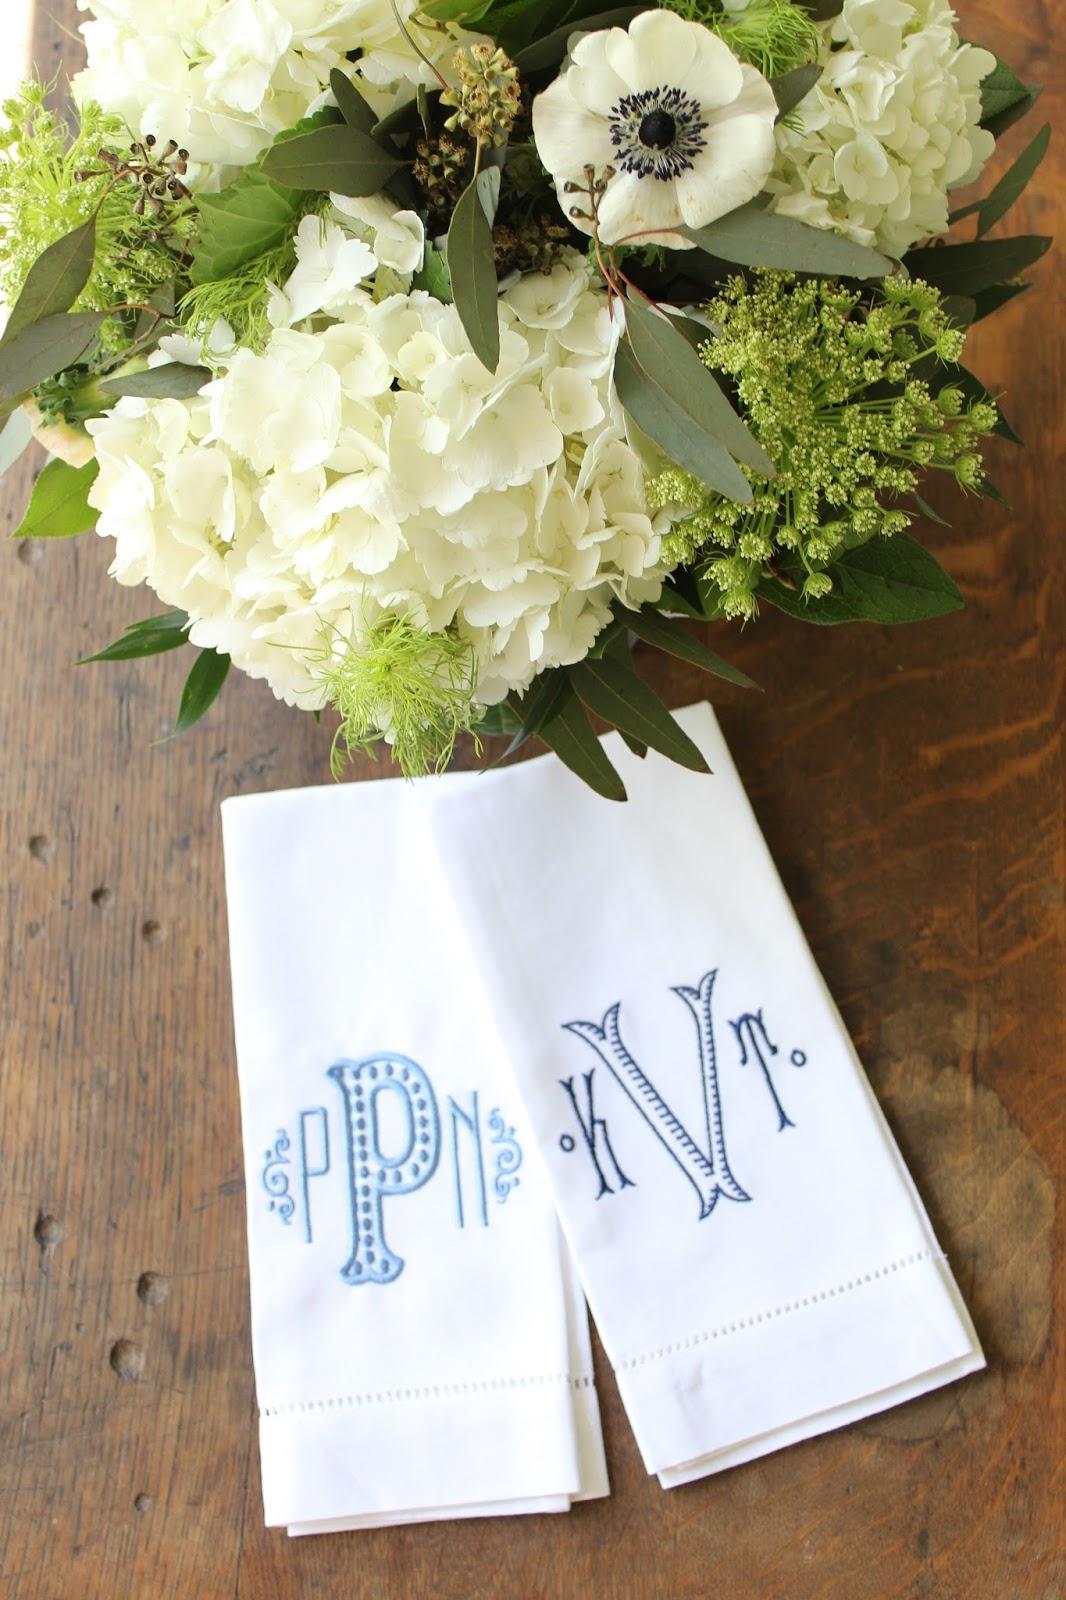 Monogrammed Tea Towels